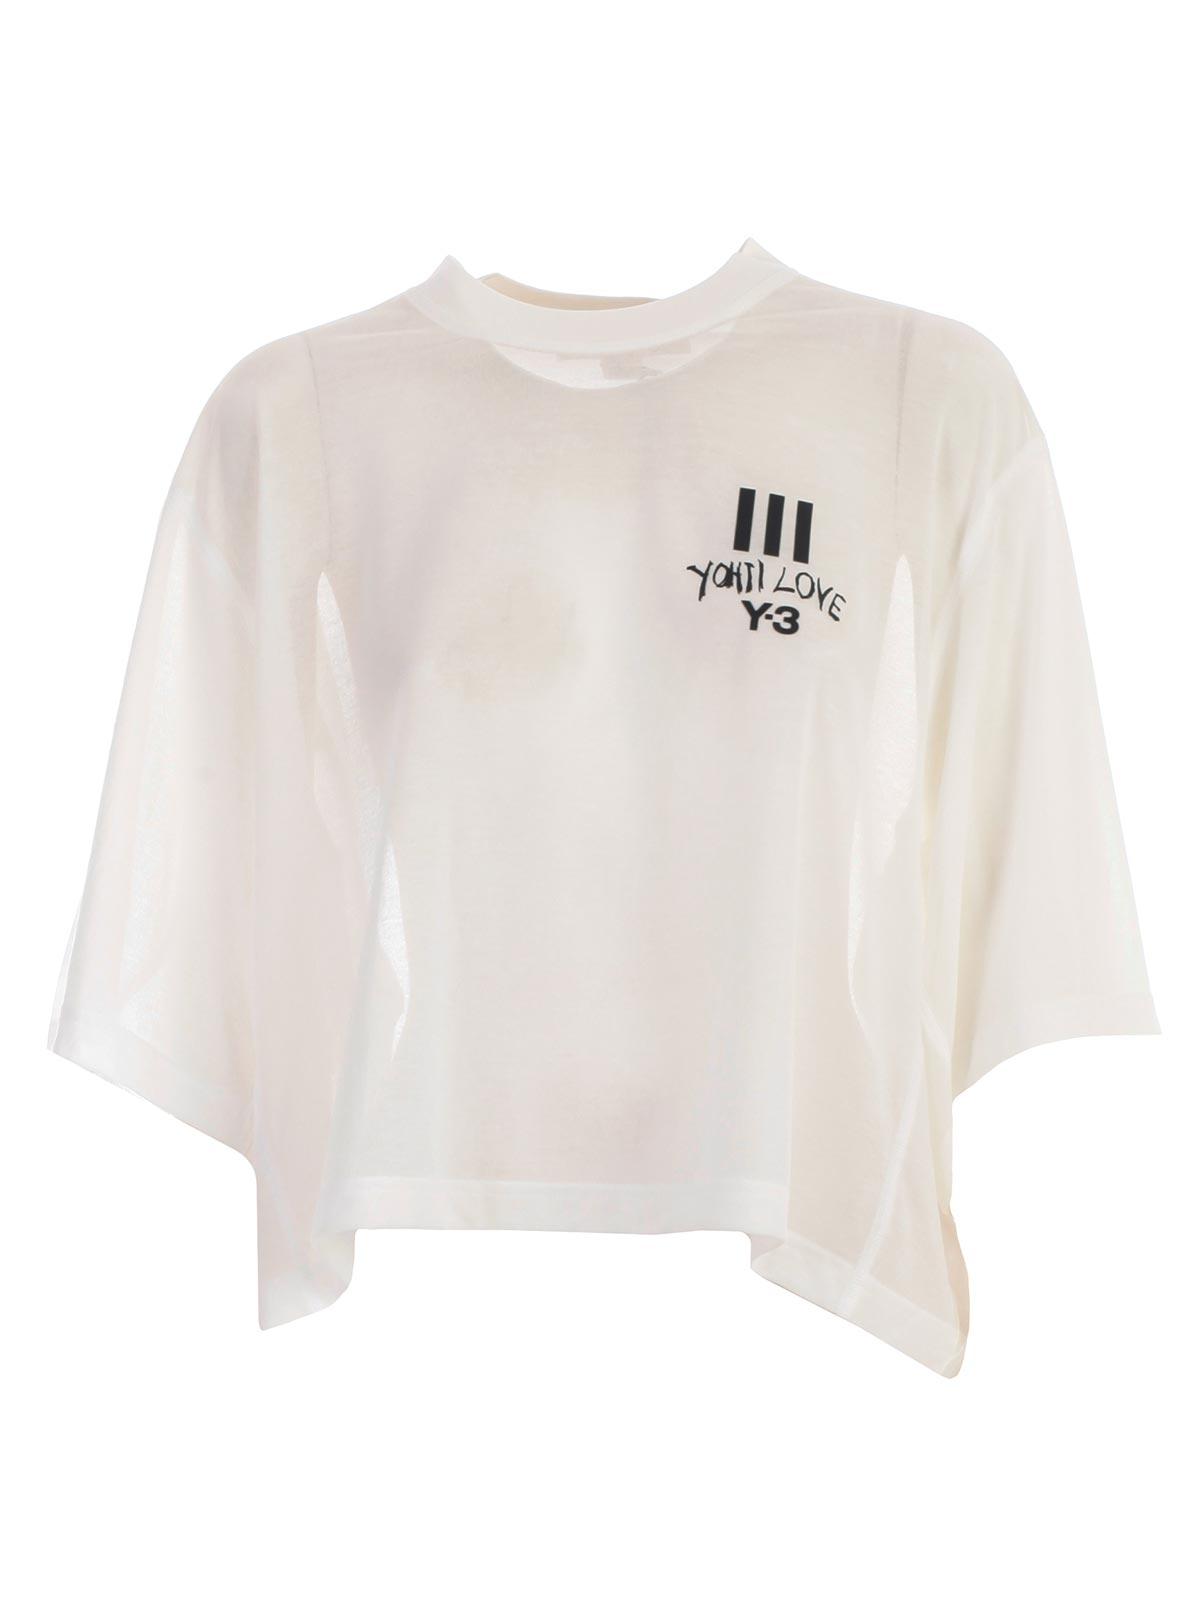 Yohji White Y Shirt Core Bernardelli 3 Dy7223 T Adidas Yamamoto 6ggpxFwR